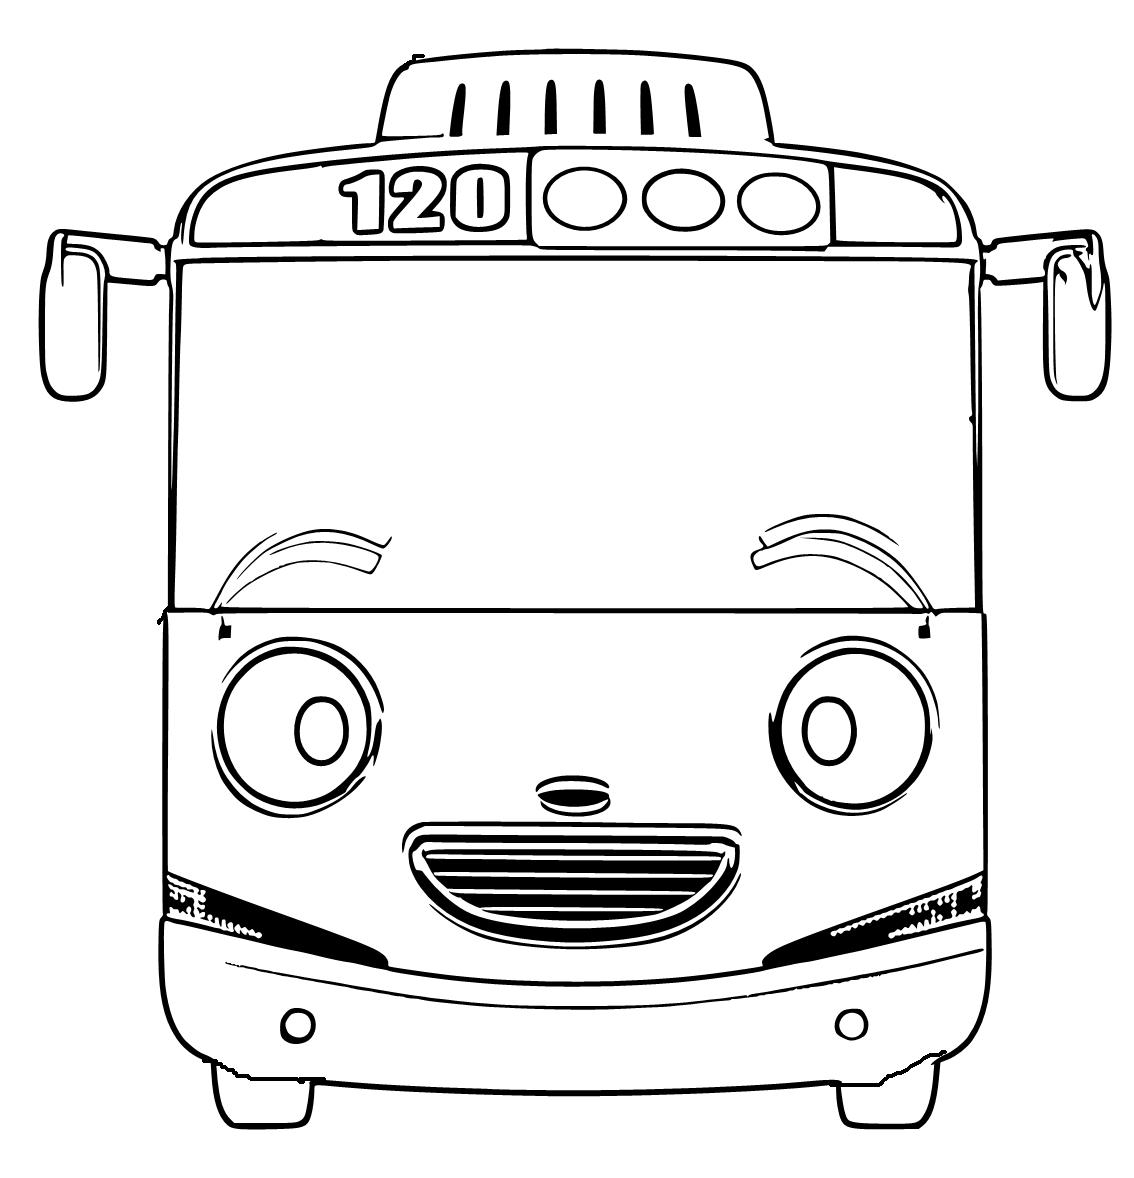 Mewarnai Gambar Bus Tayo Lucu Aneka Mewarnai